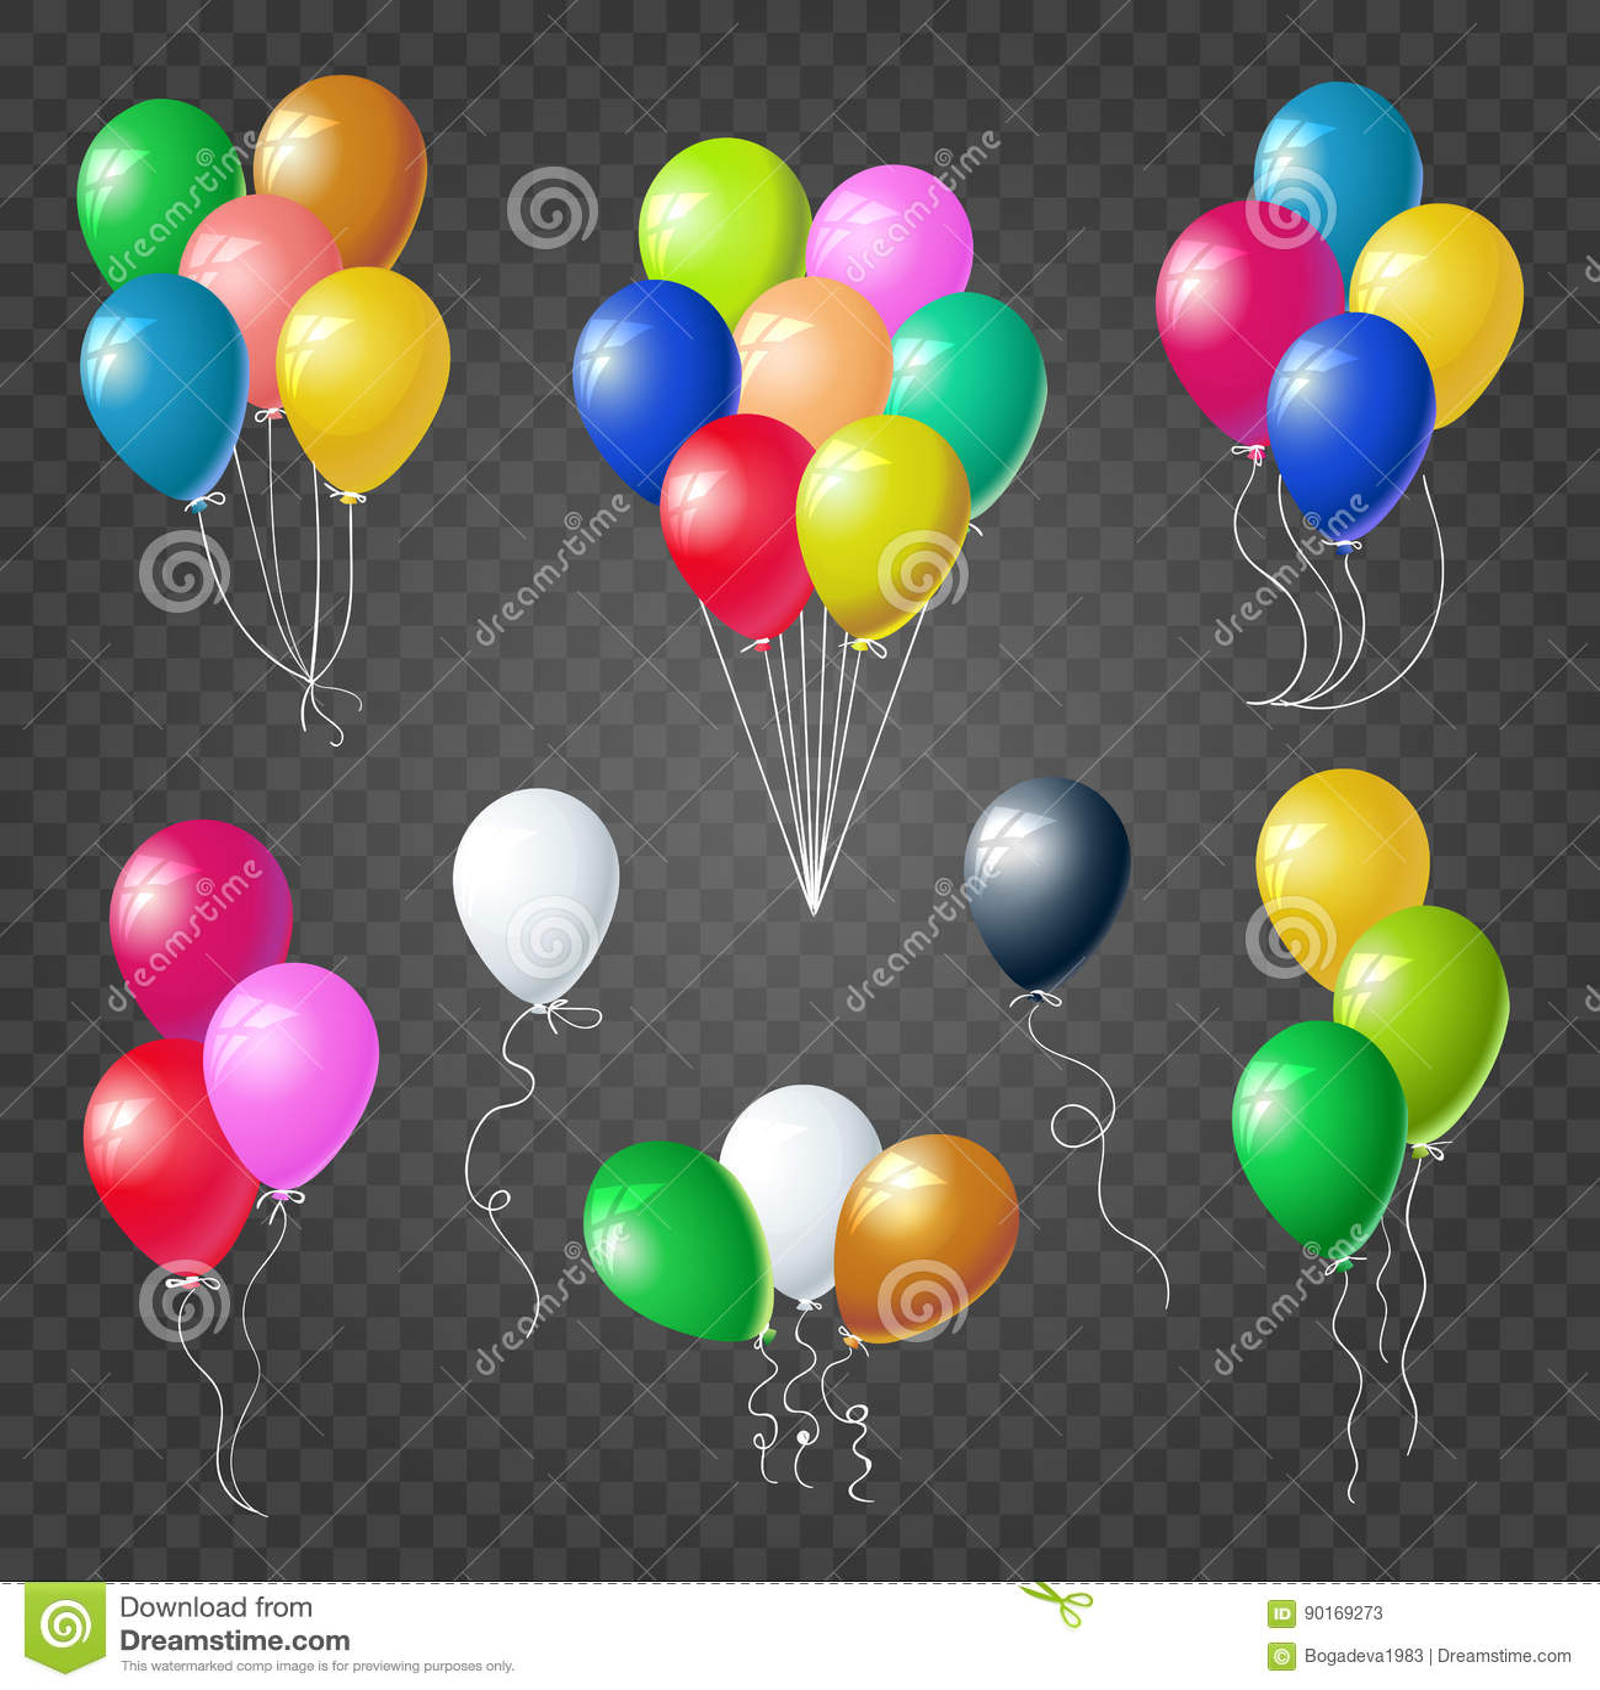 colorful helium balloons set on transparent background. Black Bedroom Furniture Sets. Home Design Ideas